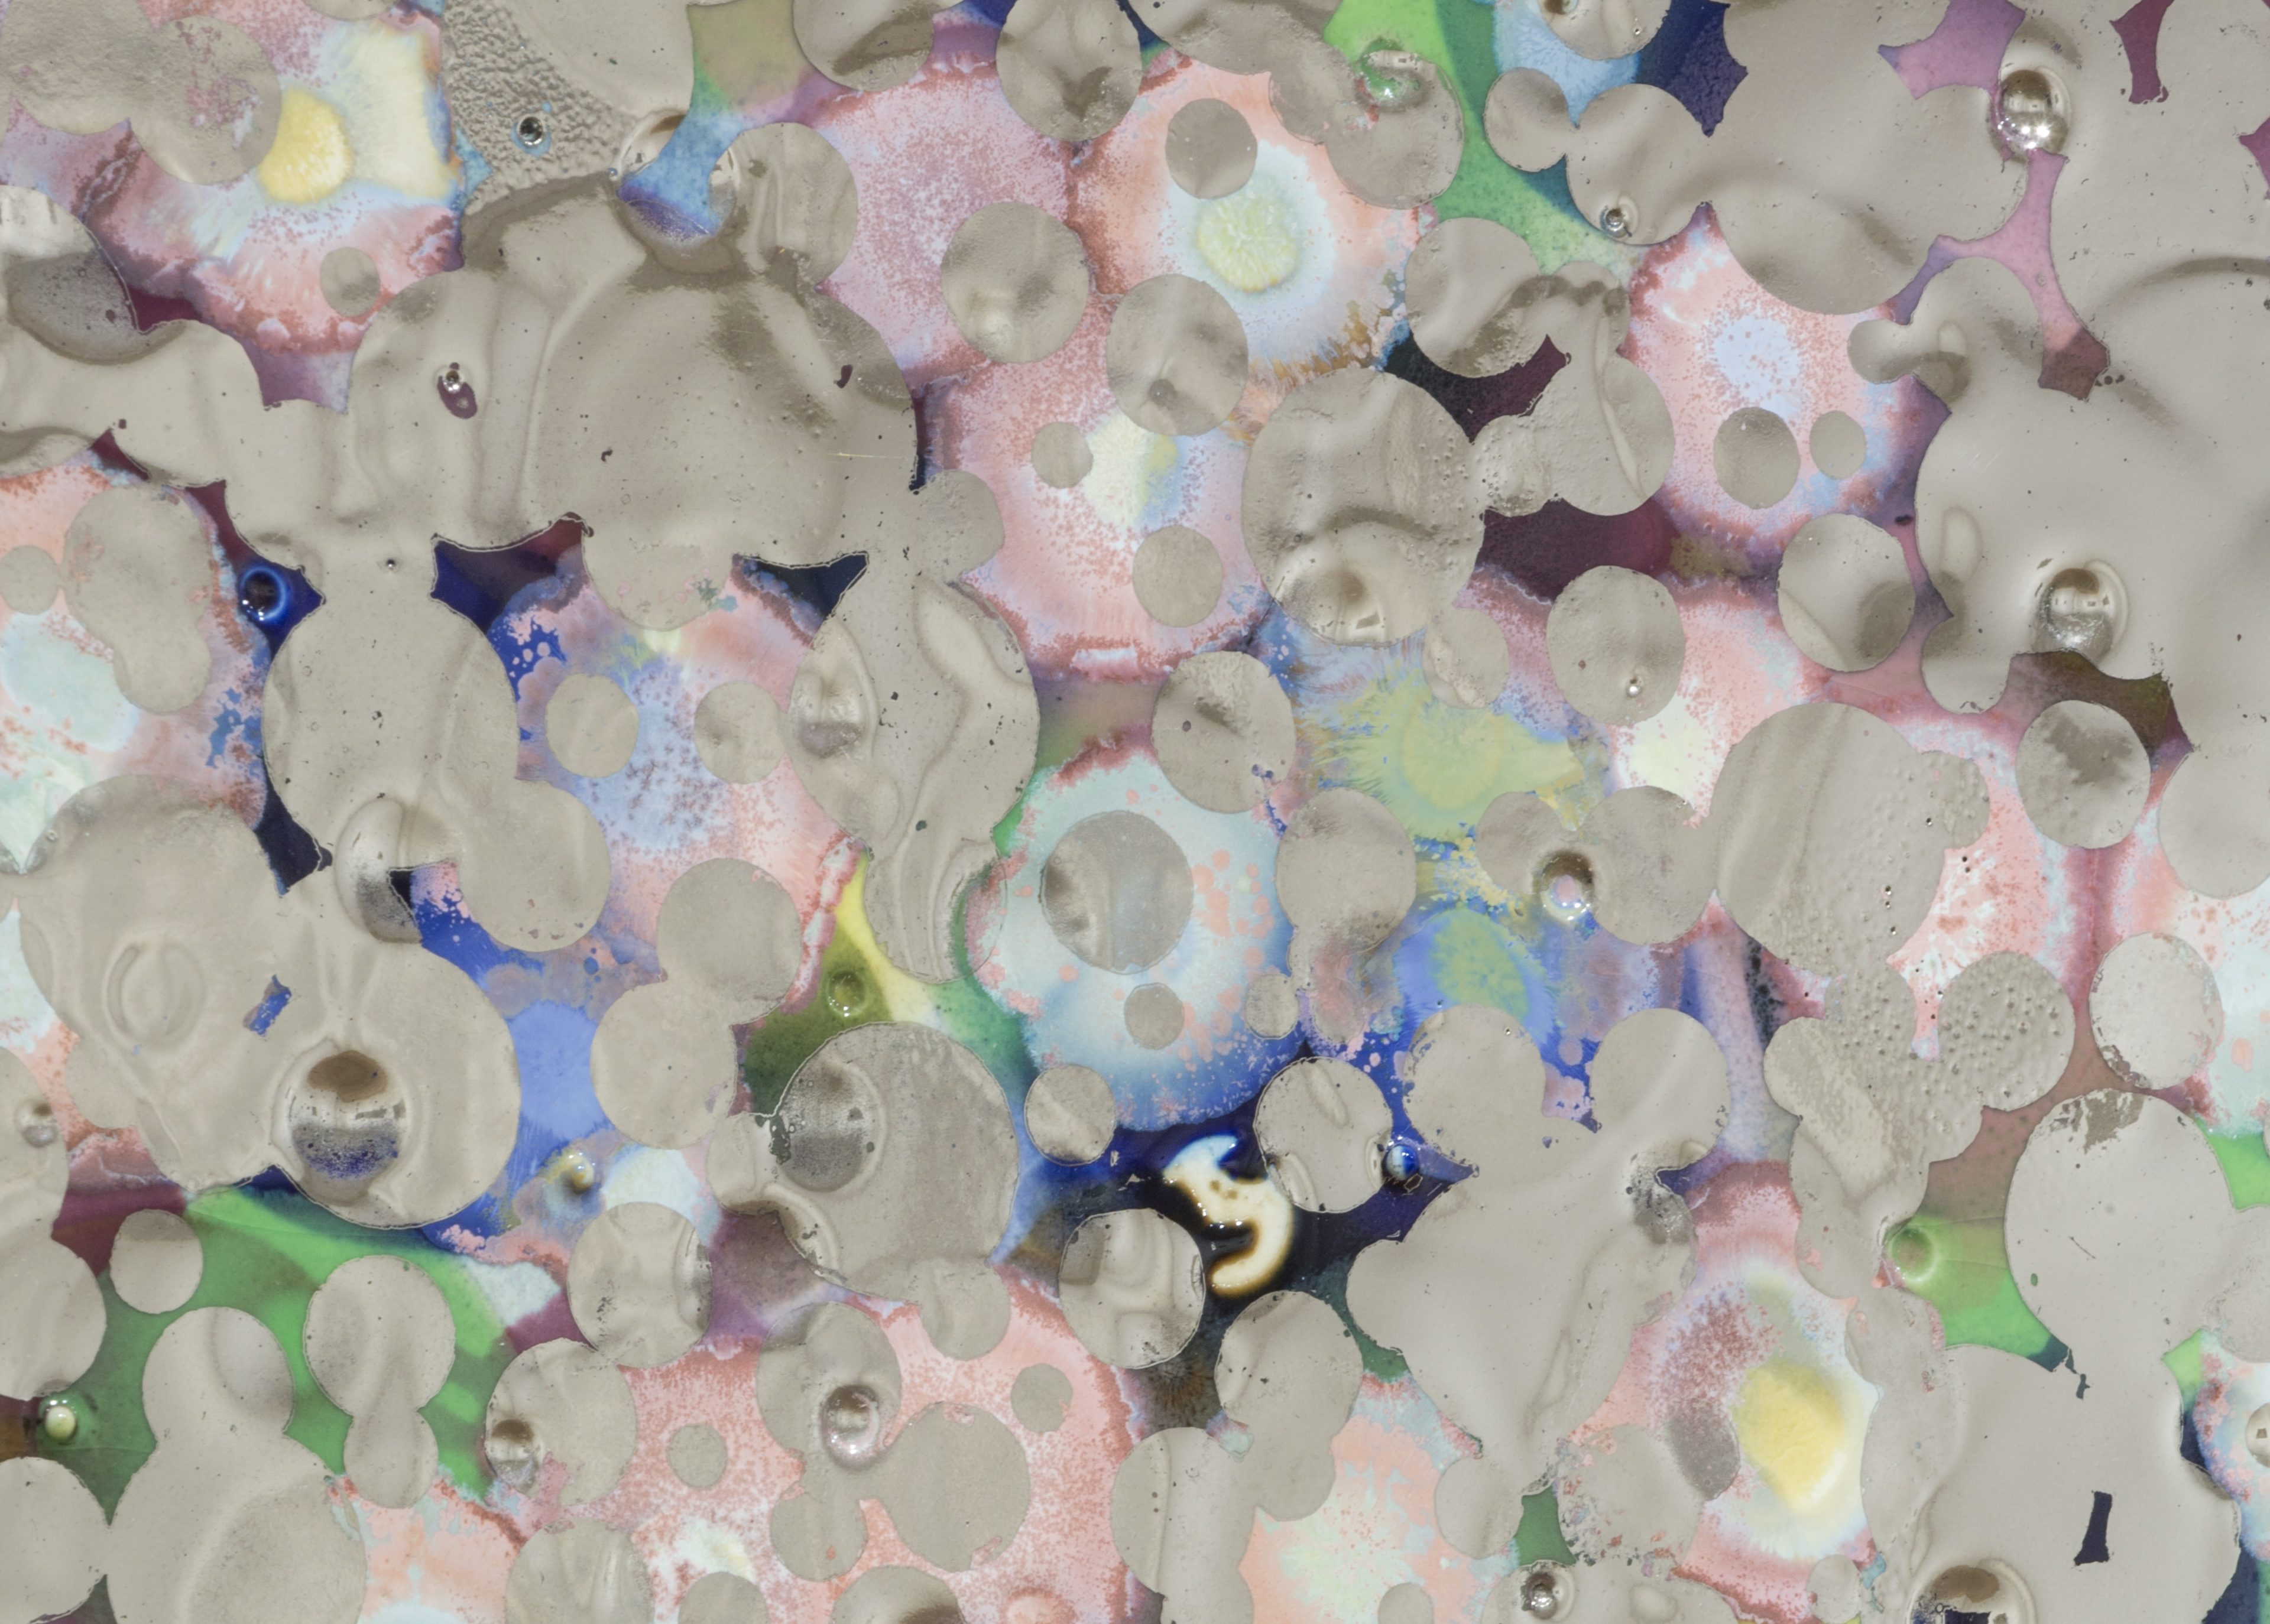 Lionel Estève Untitled (Mirror), 2016 (detail) Porcelain, colored underglaze, crystallizations, platinum 70 x 70 cm / 27 9/16 x 27 9/16 in © Youngha Cho / Courtesy Perrotin